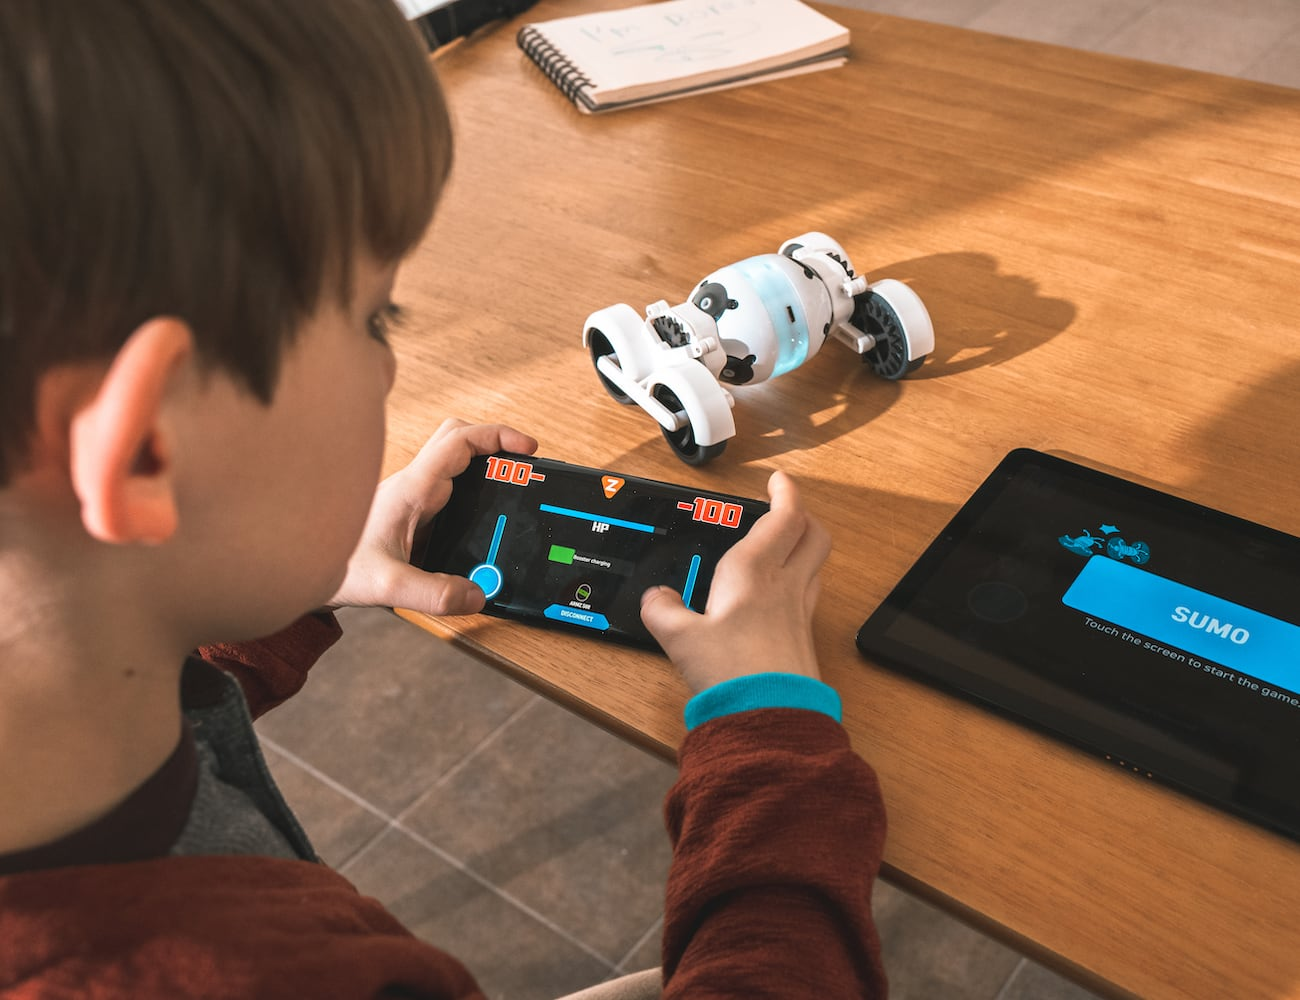 Armz Smart Customizable AR Robot transforms into whatever you like